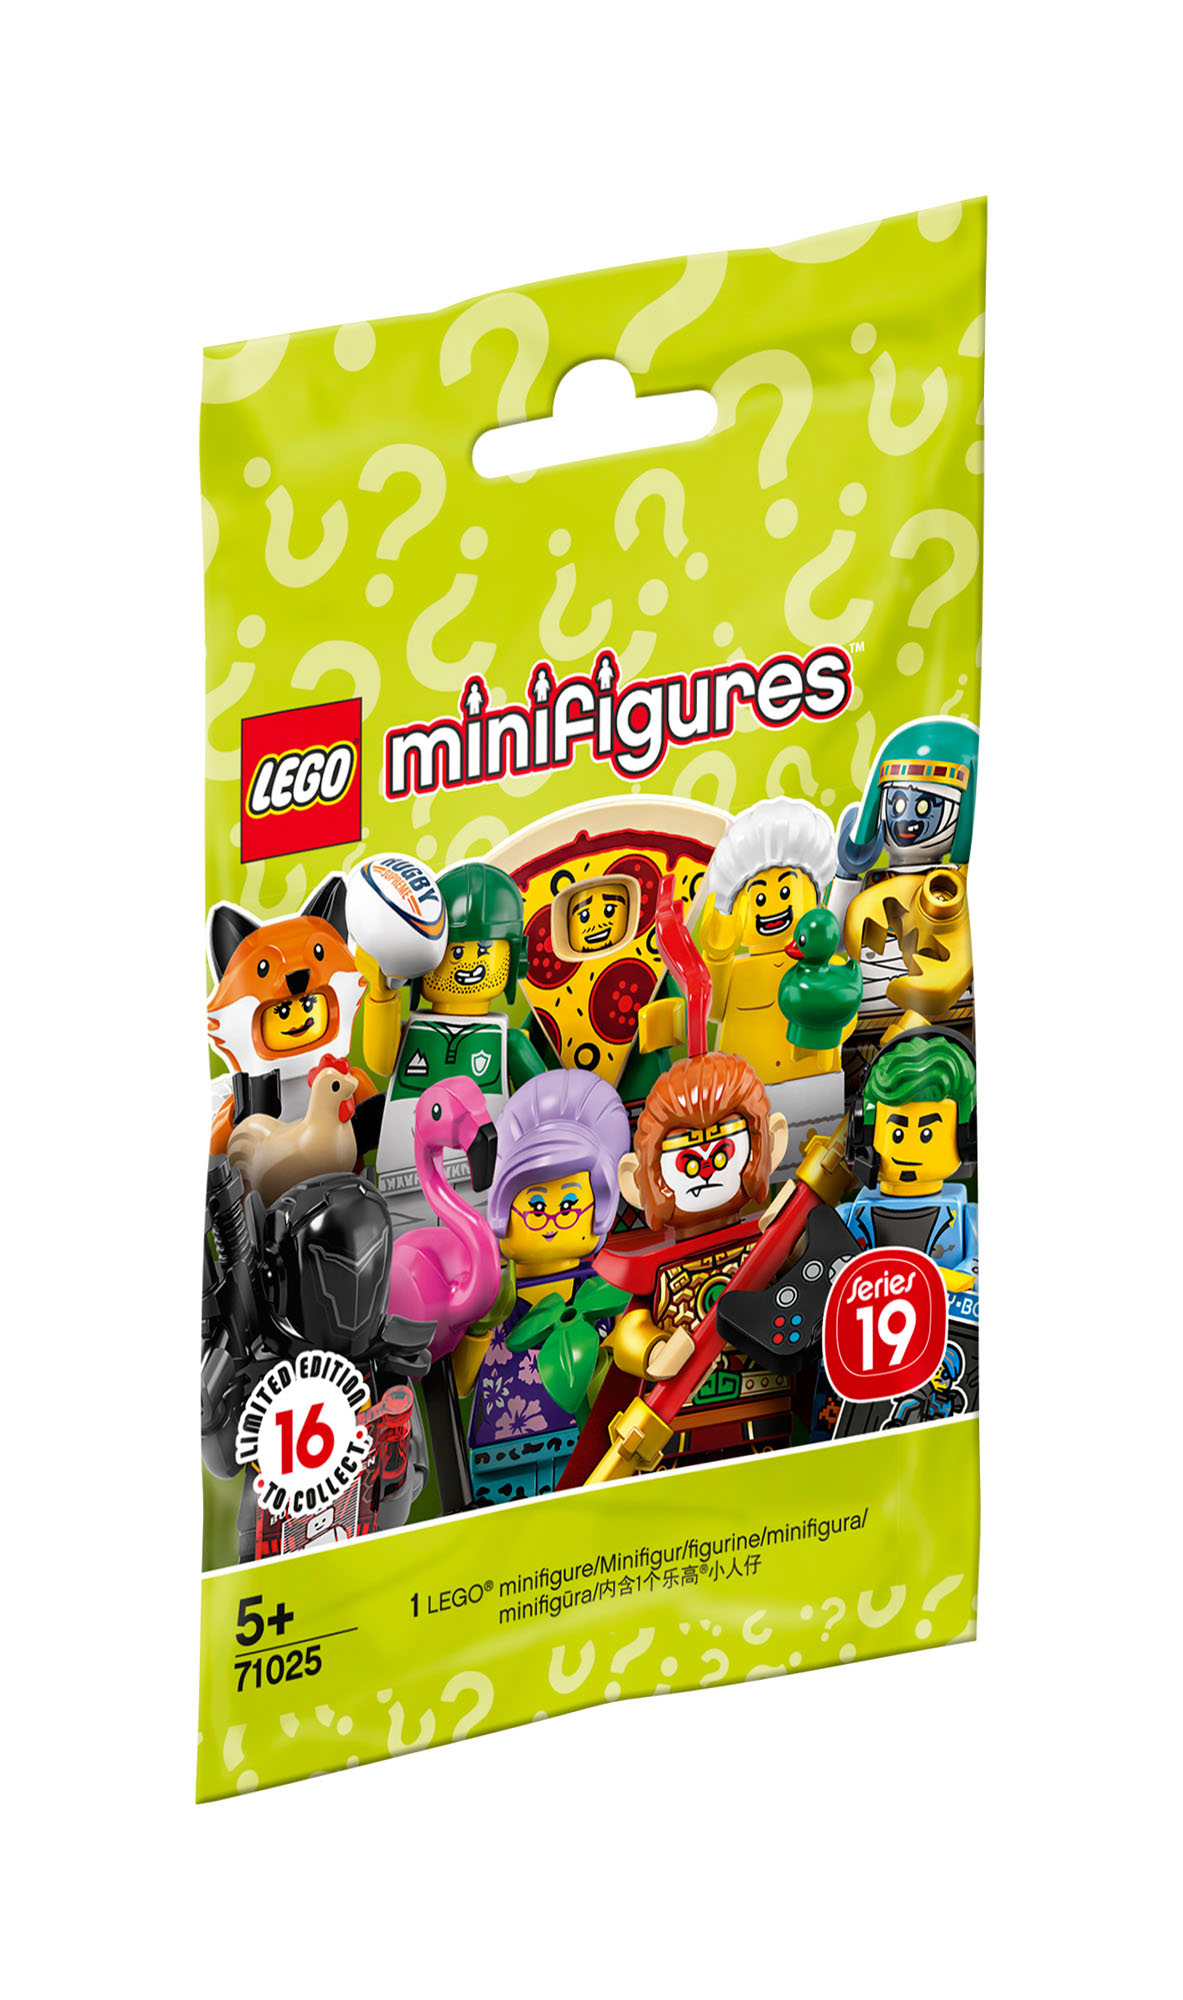 71027 LEGO Minifigures Series 20 includes x1 Random Figure Age 5 Years+